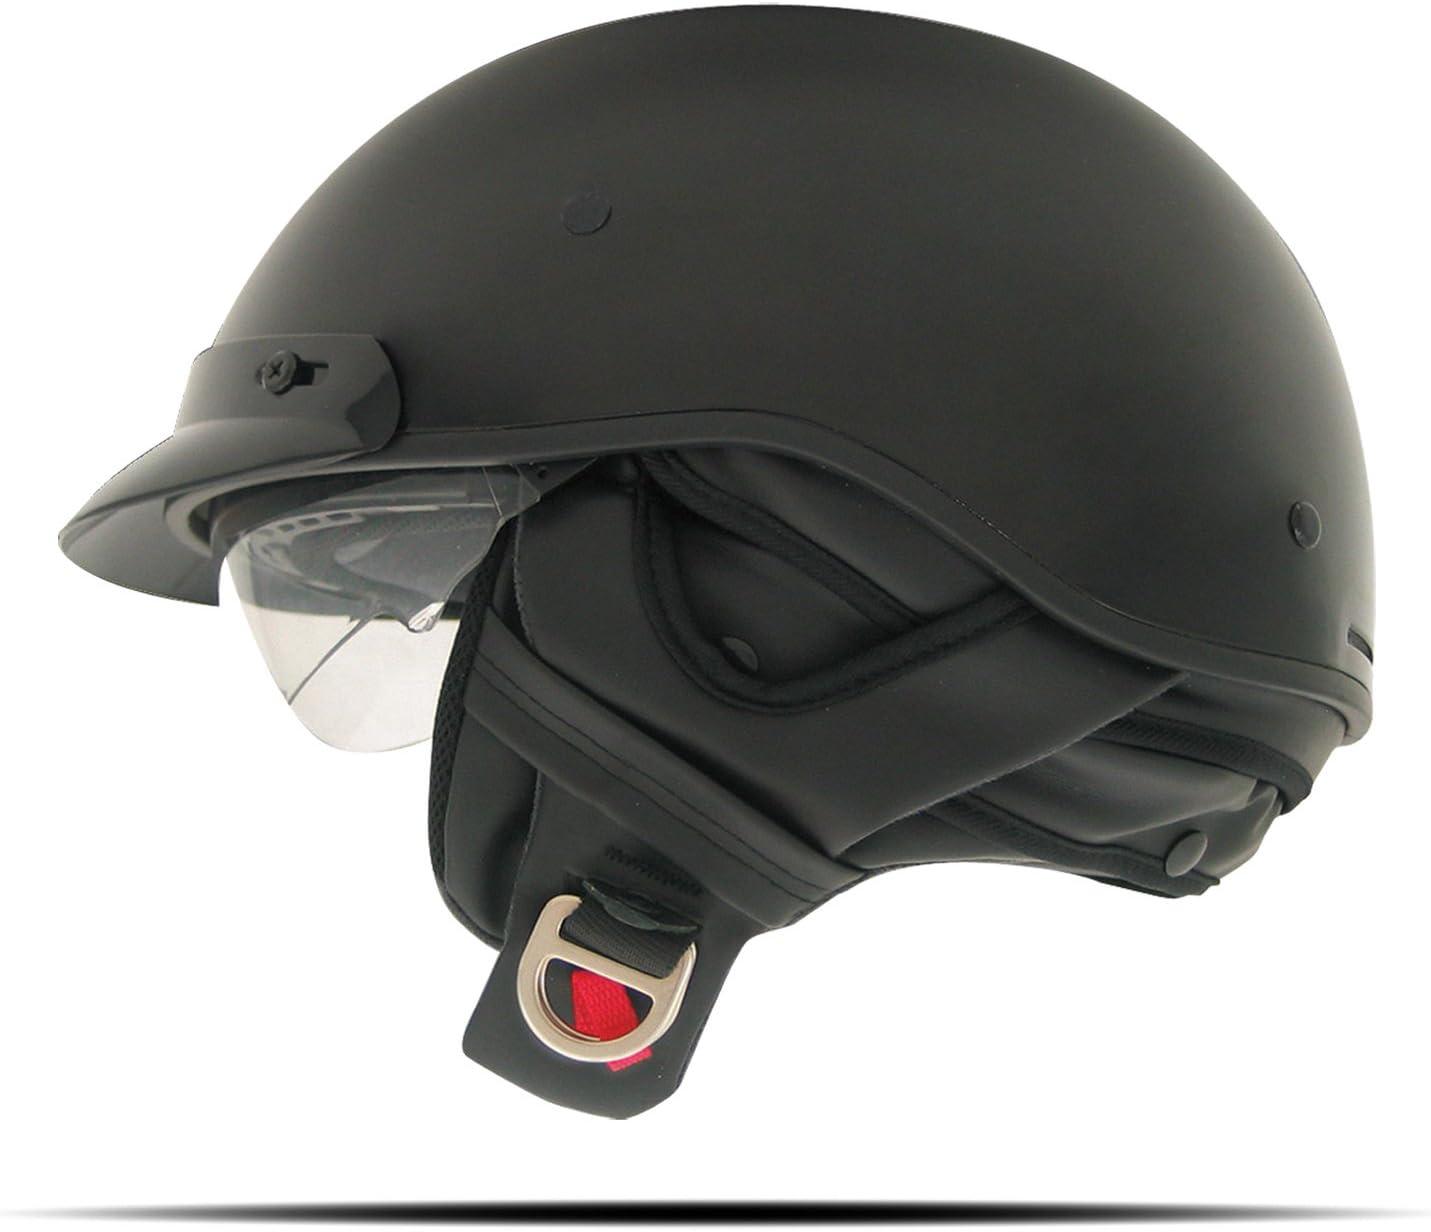 Zoan Low price Route 66 Half Challenge the lowest price of Japan ☆ Helmet 2Xl Matte Black -